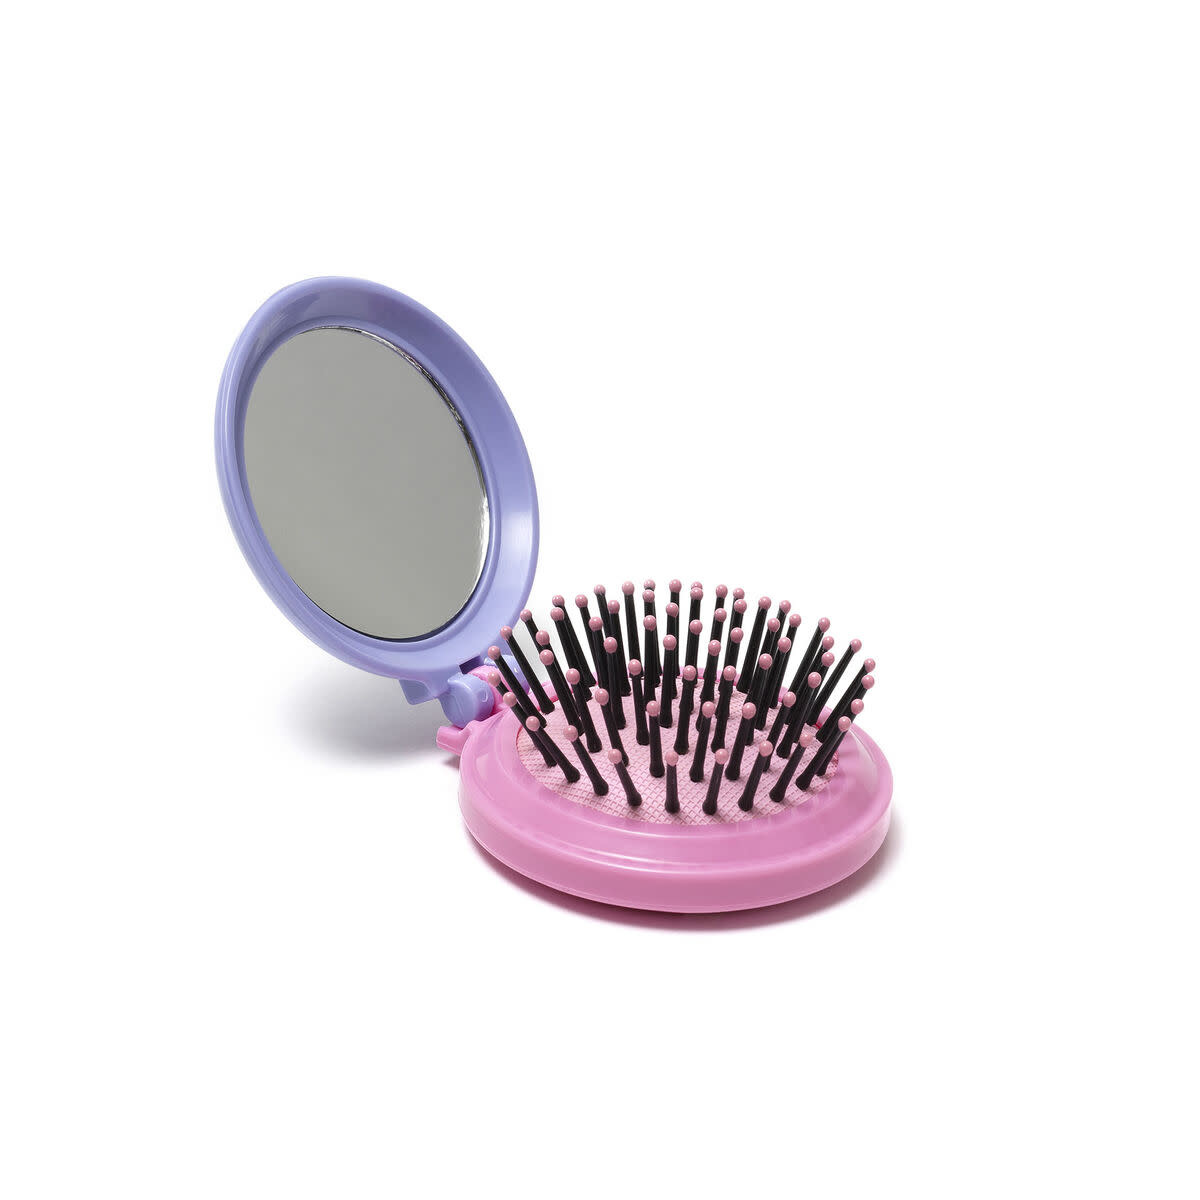 Legami Nice hair - hairbrush unicon